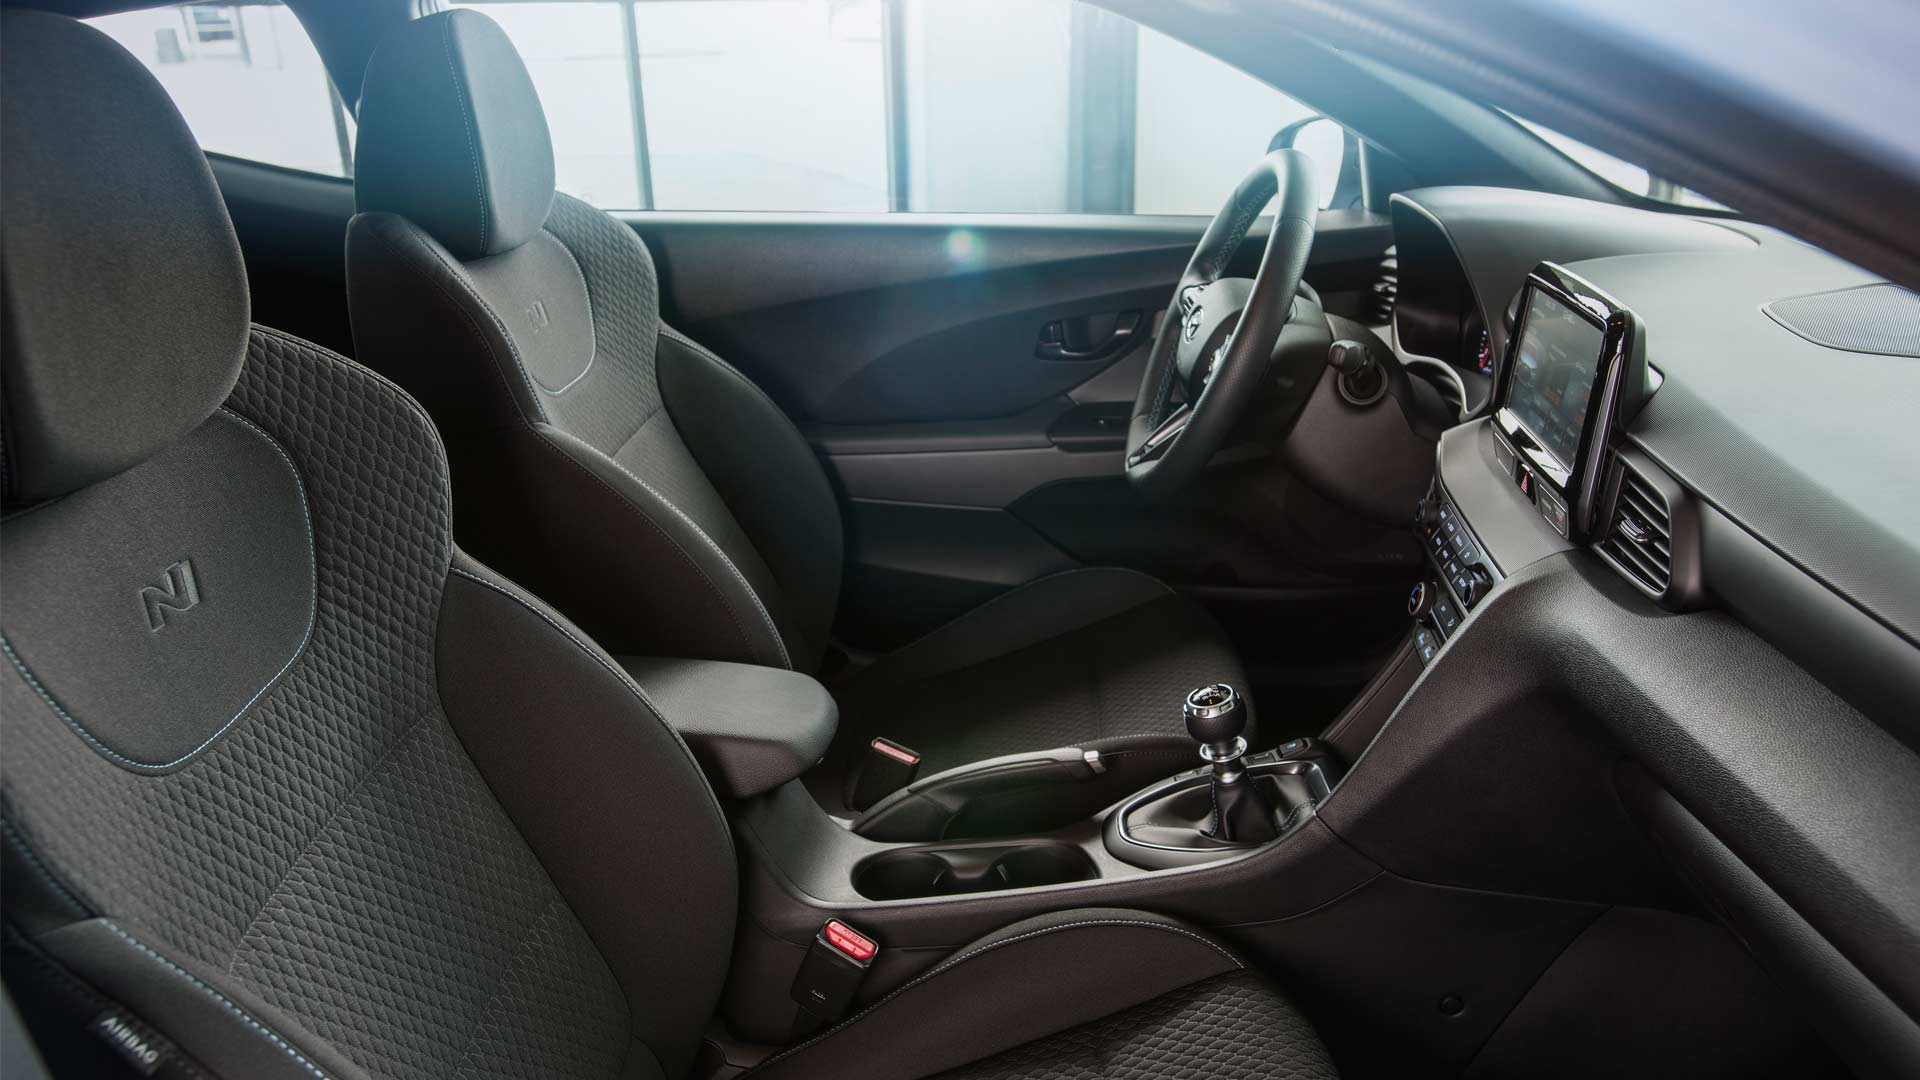 2019-Hyundai-Veloster-N-Interior_3